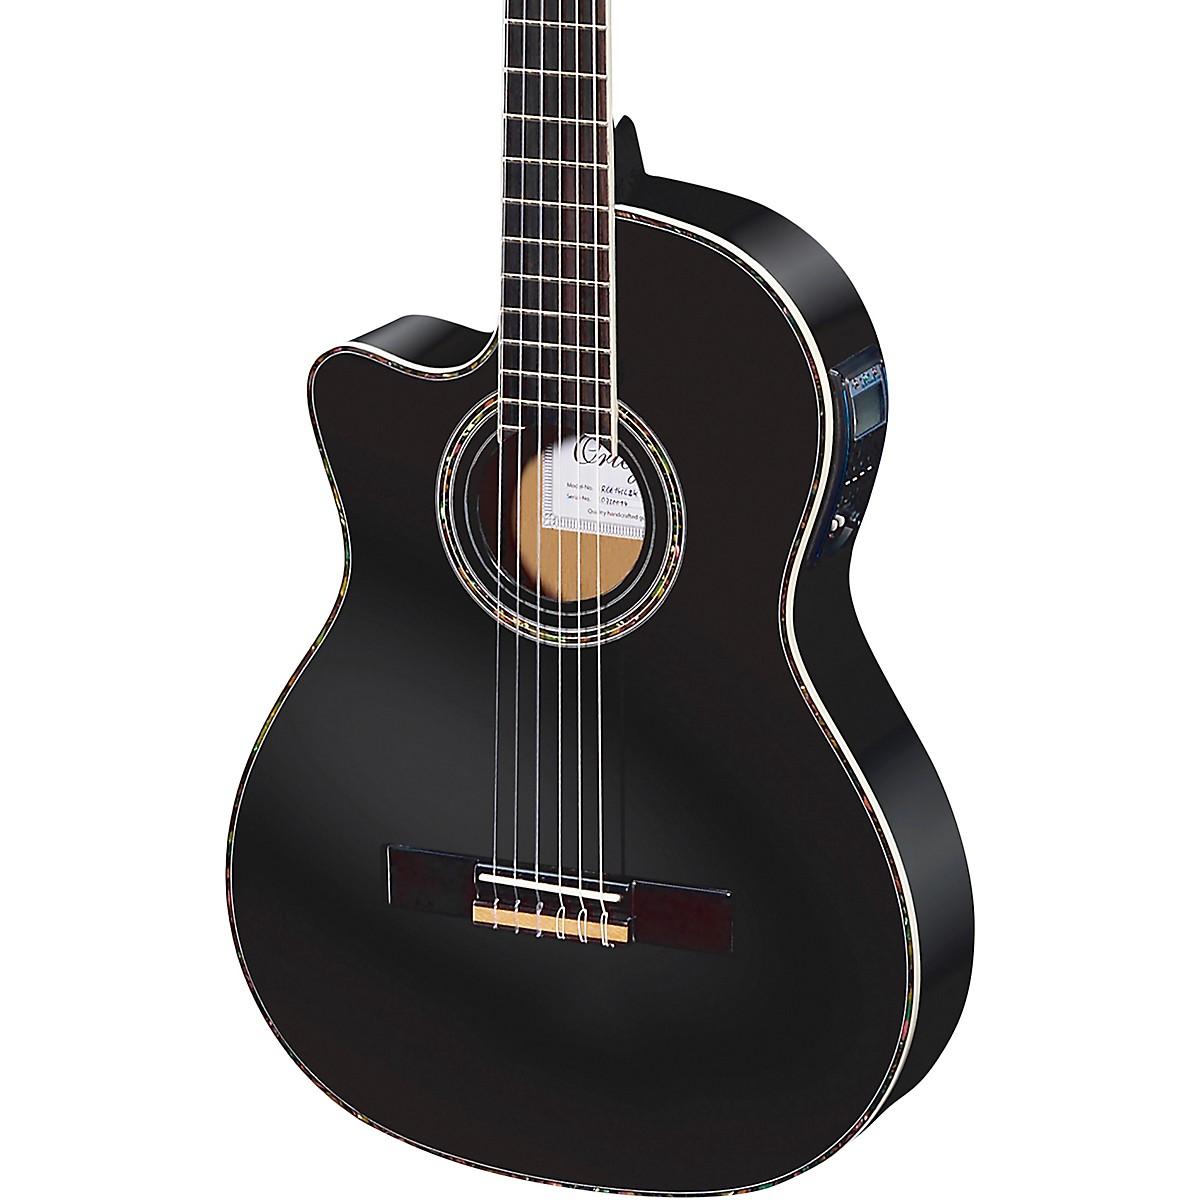 Ortega Family Series Pro RCE145LBK Thinline Acoustic-Electric Left-Handed Nylon Guitar